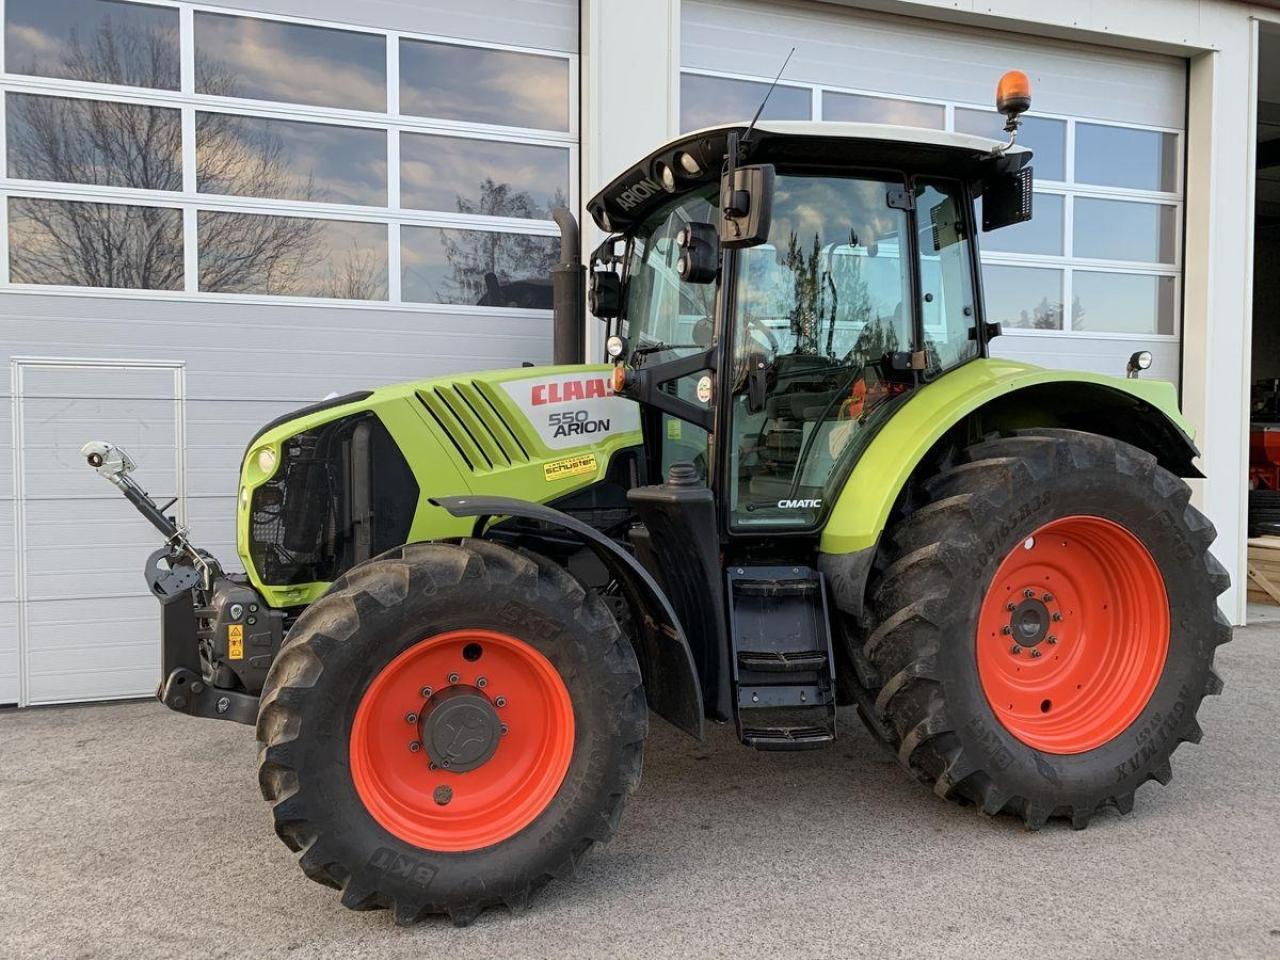 wheel tractor CLAAS arion 550 cmatic